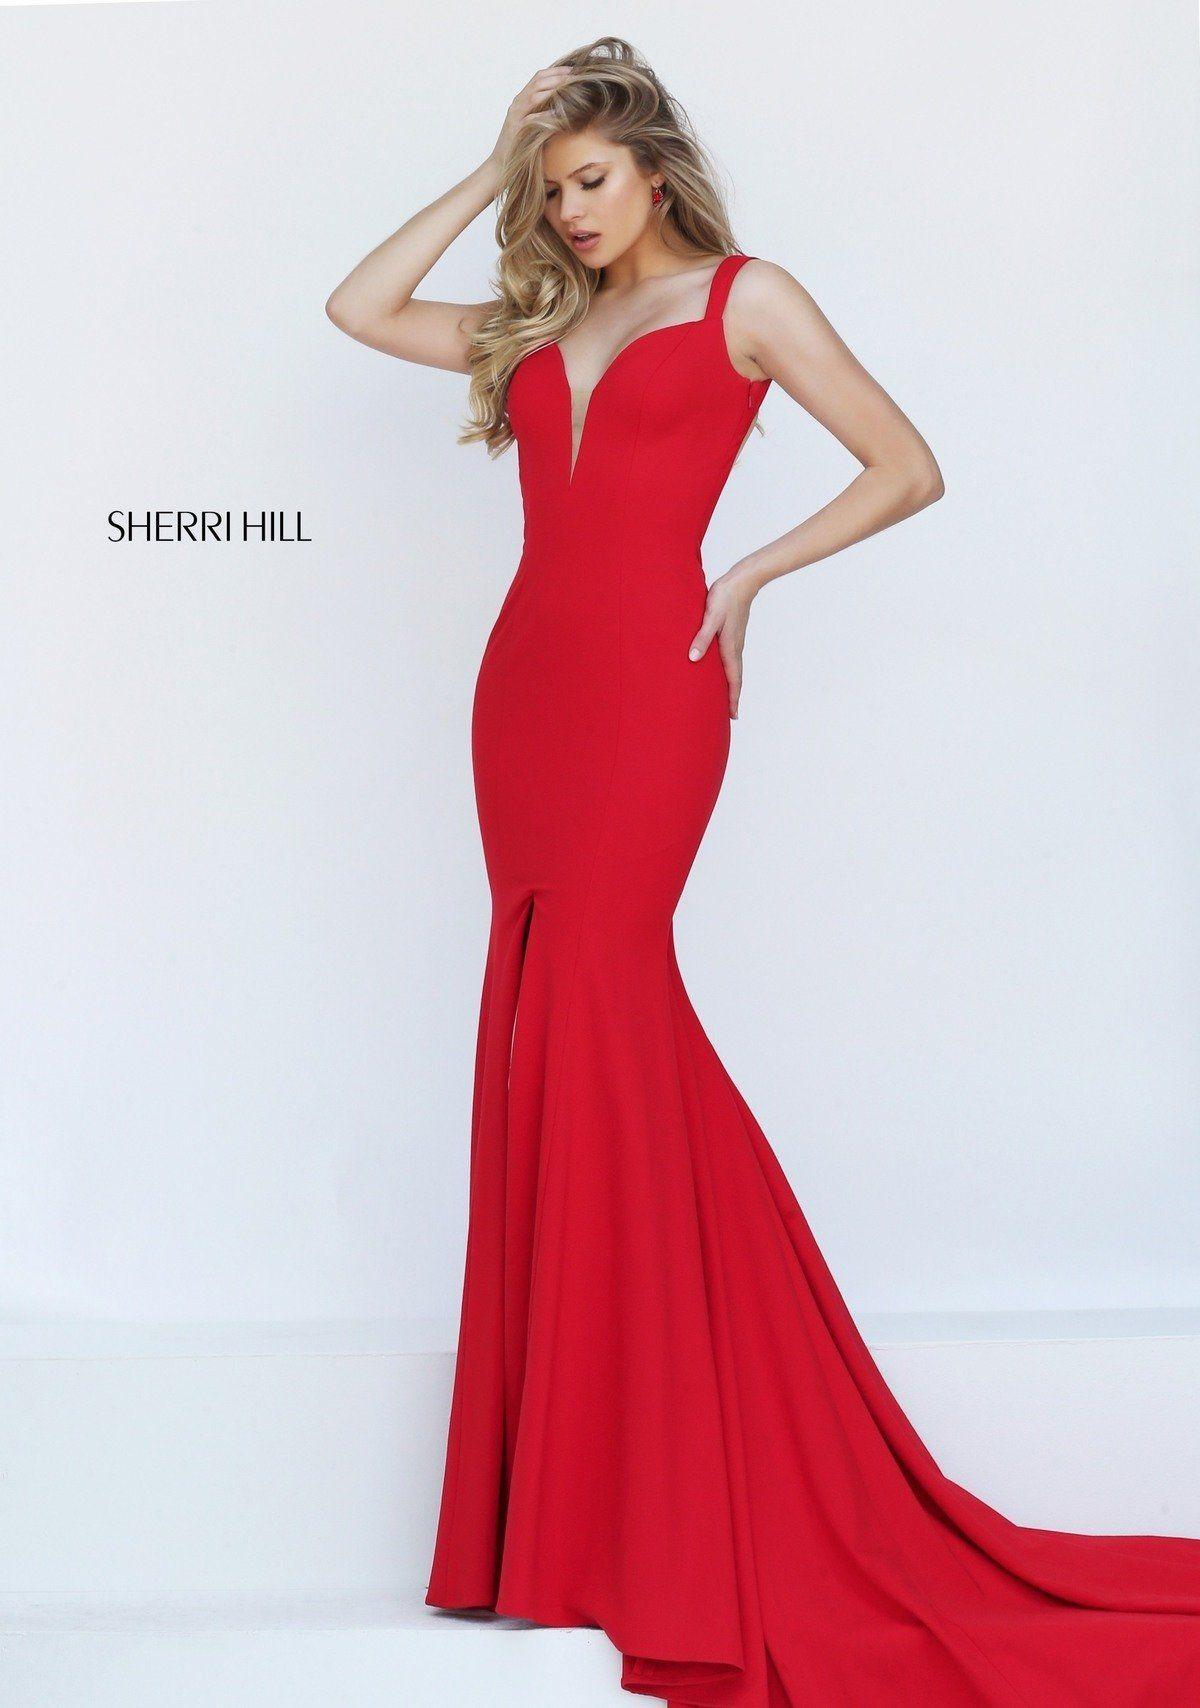 Style sherri hill pinterest fashion